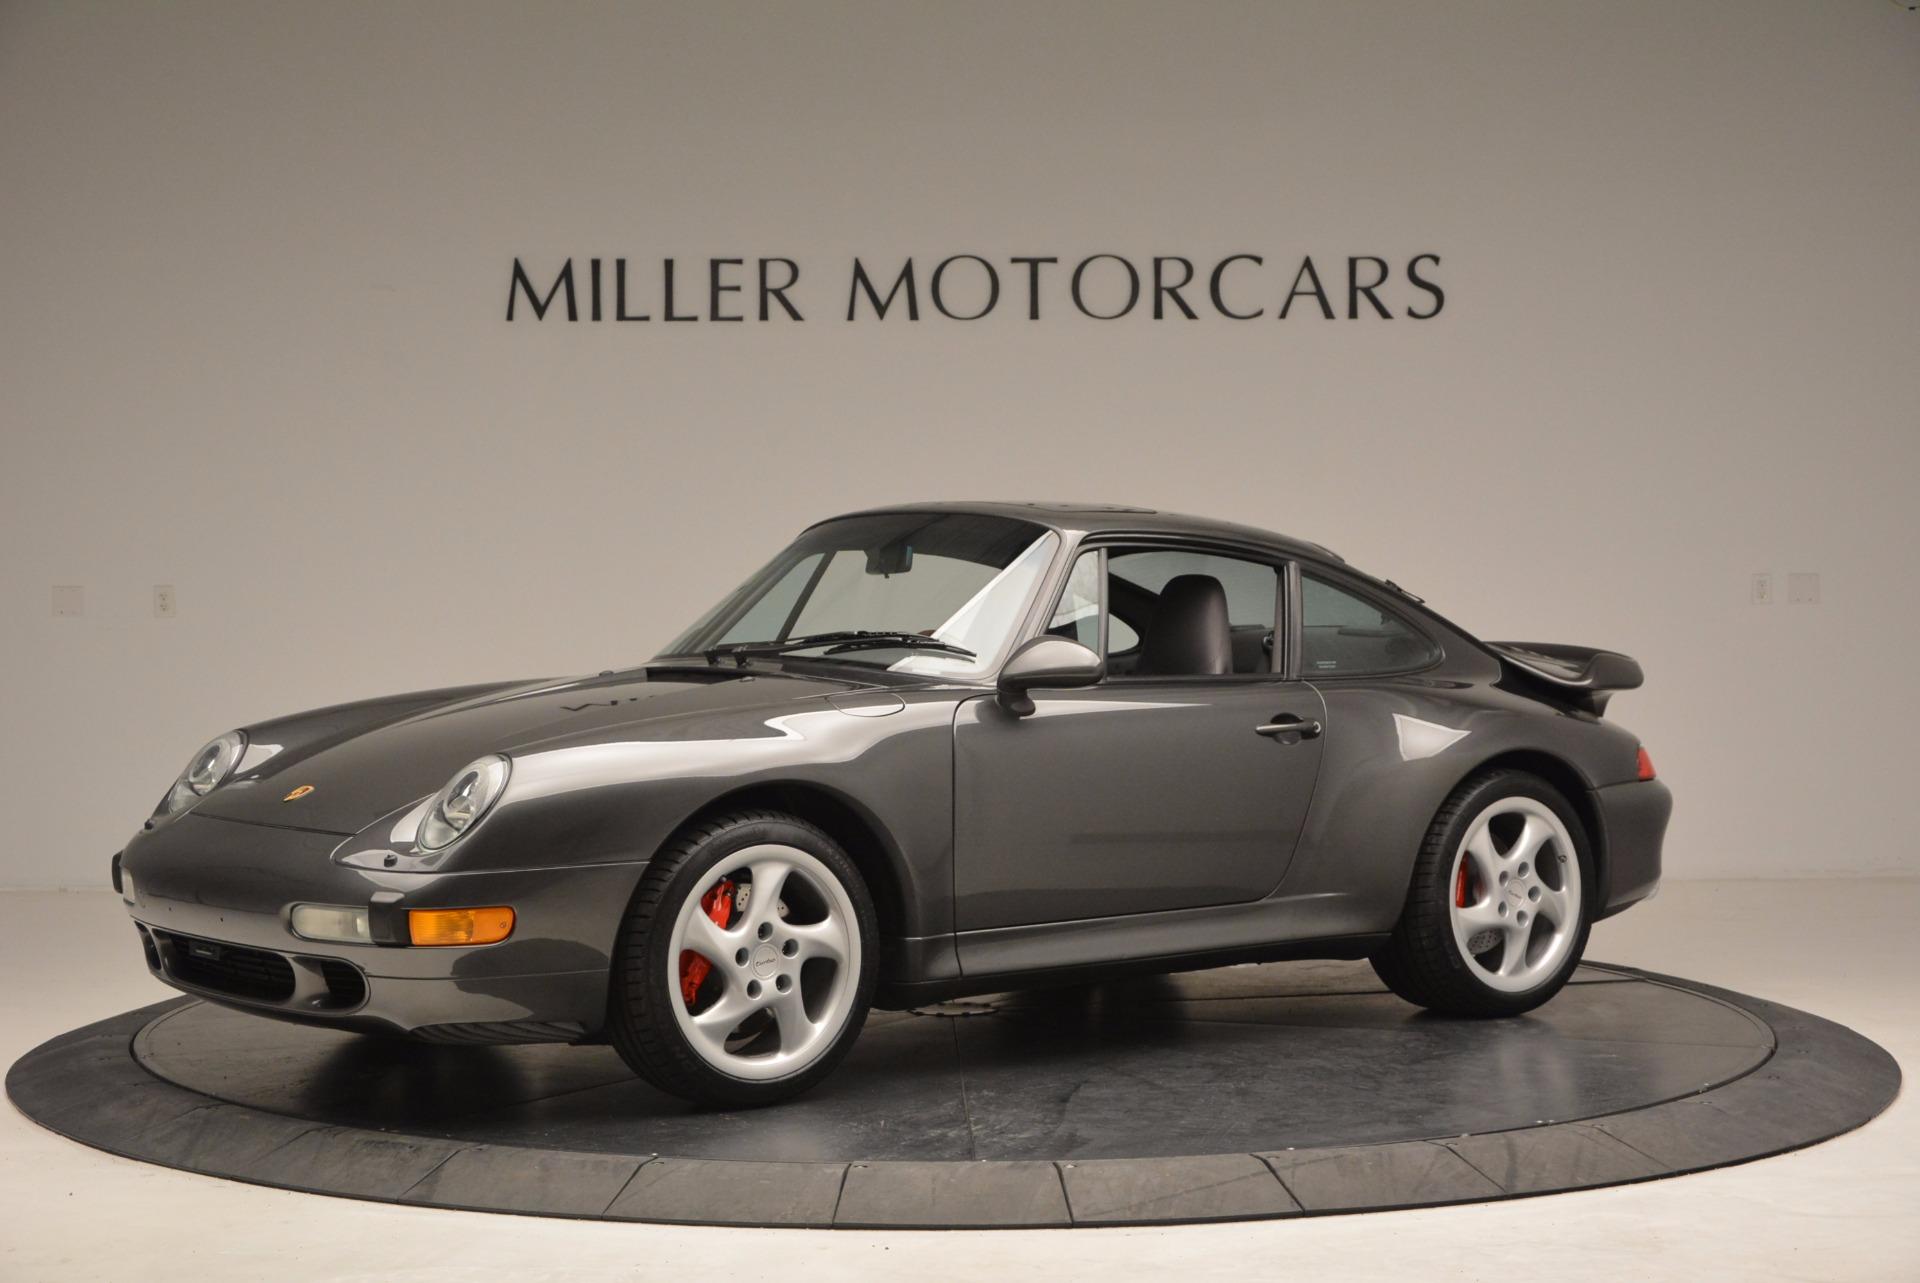 Used 1996 Porsche 911 Turbo For Sale In Greenwich, CT 1058_p2